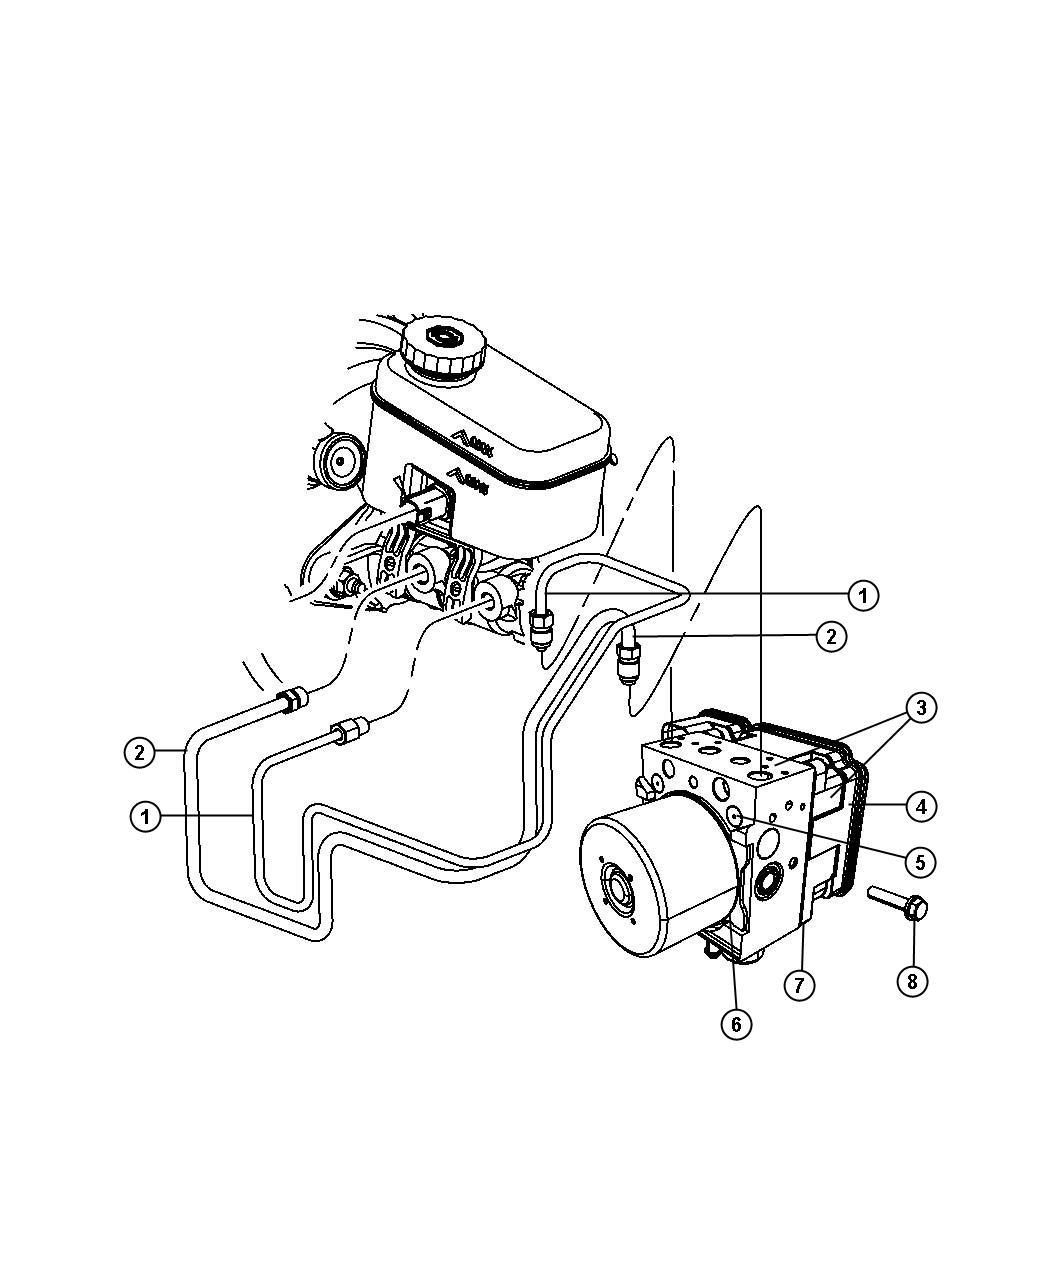 Jeep Wrangler Module Anti Lock Brake System Electronic